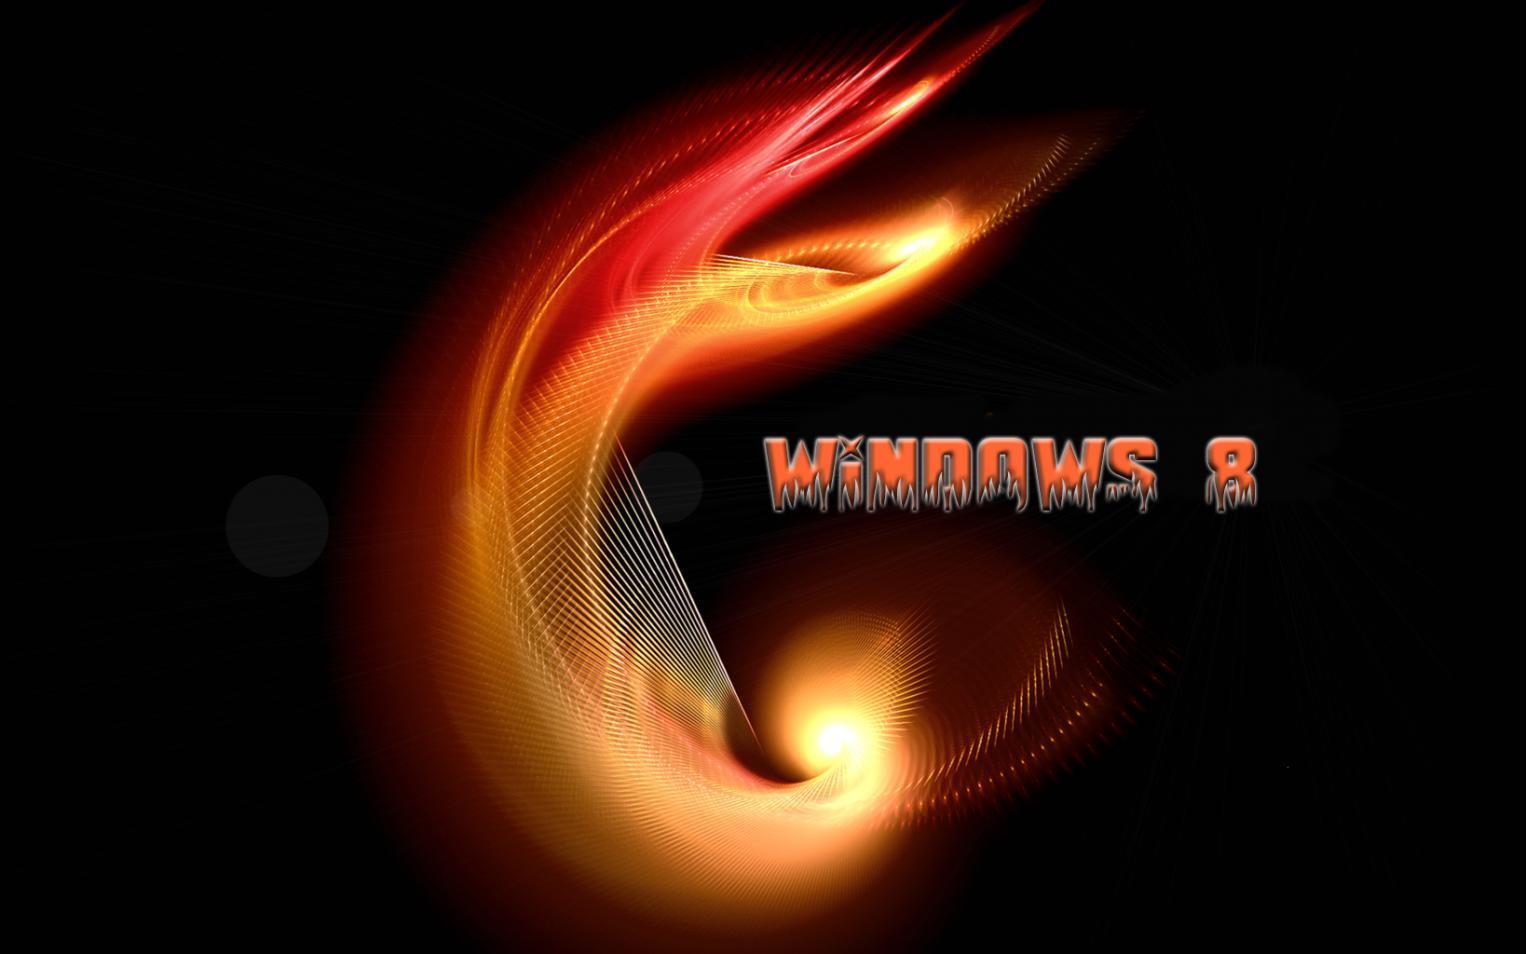 hd windows 8 duvar katlar windows 8 wallpaper masast 1526x954